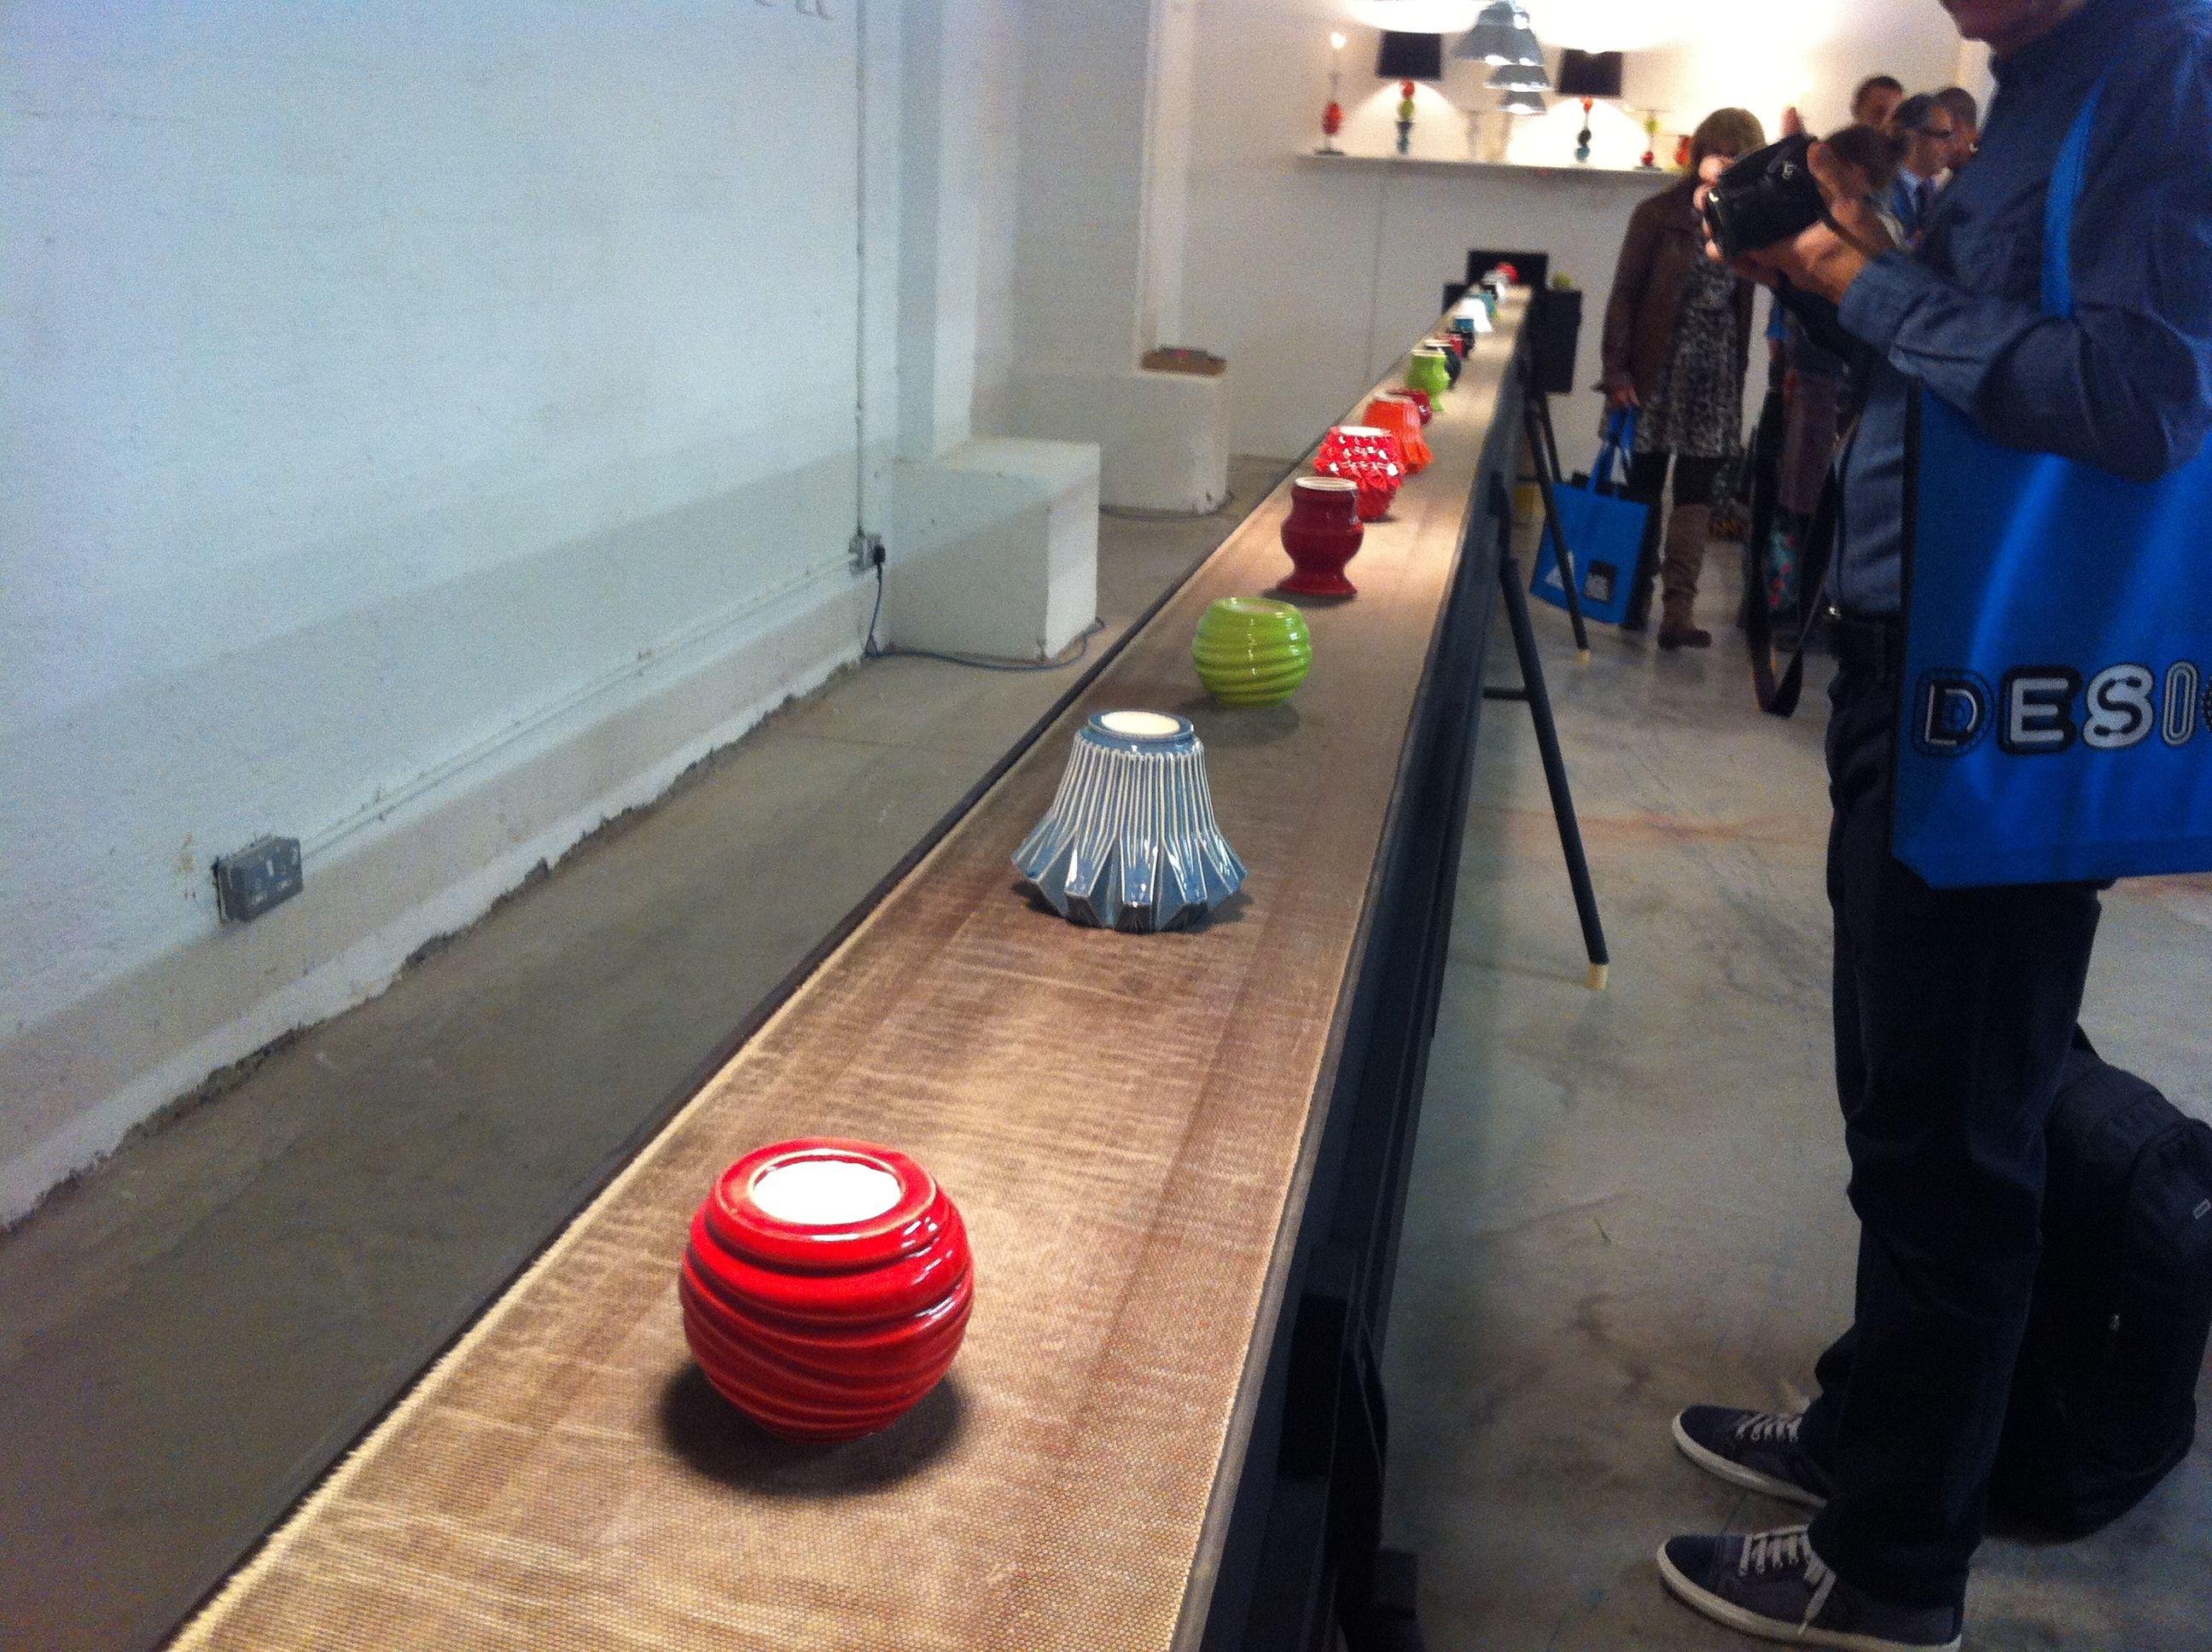 Design festival · Conveyor belt pottery display - Tent London & Conveyor belt pottery display - Tent London | shop ideas ...